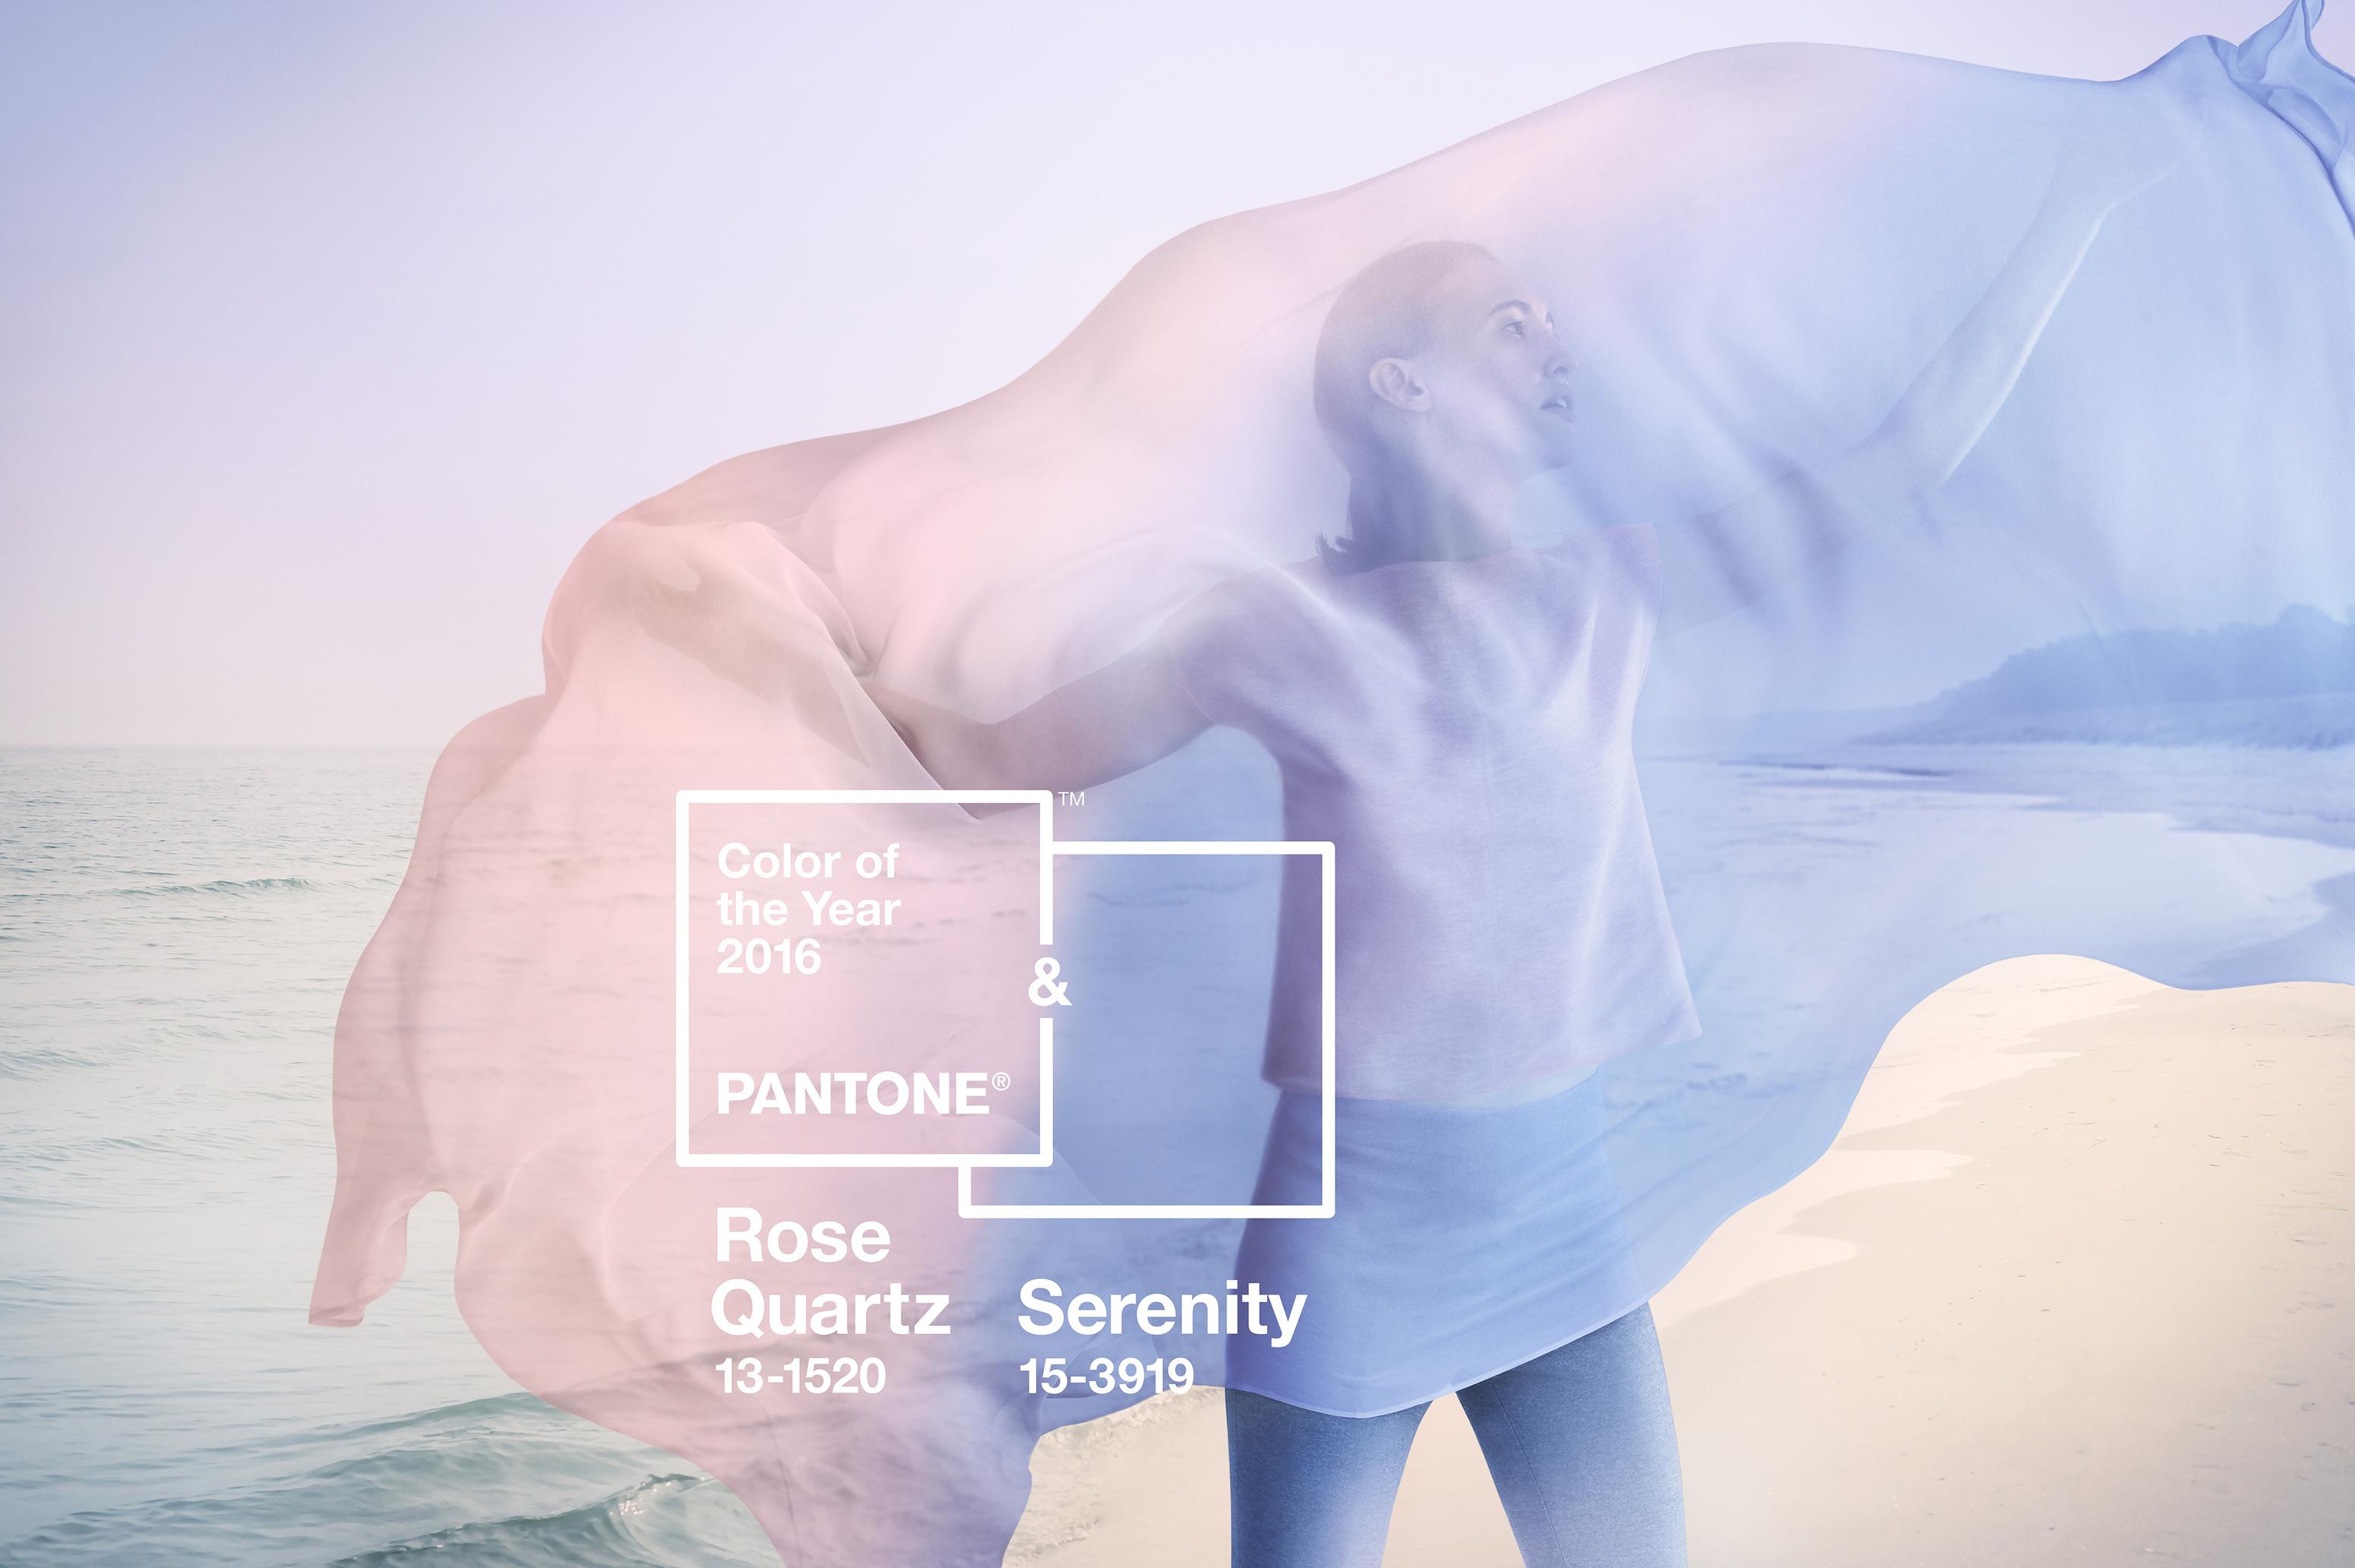 fpt12.05-pantone-farben-des-jahres-2016-serenity-rose-quartz